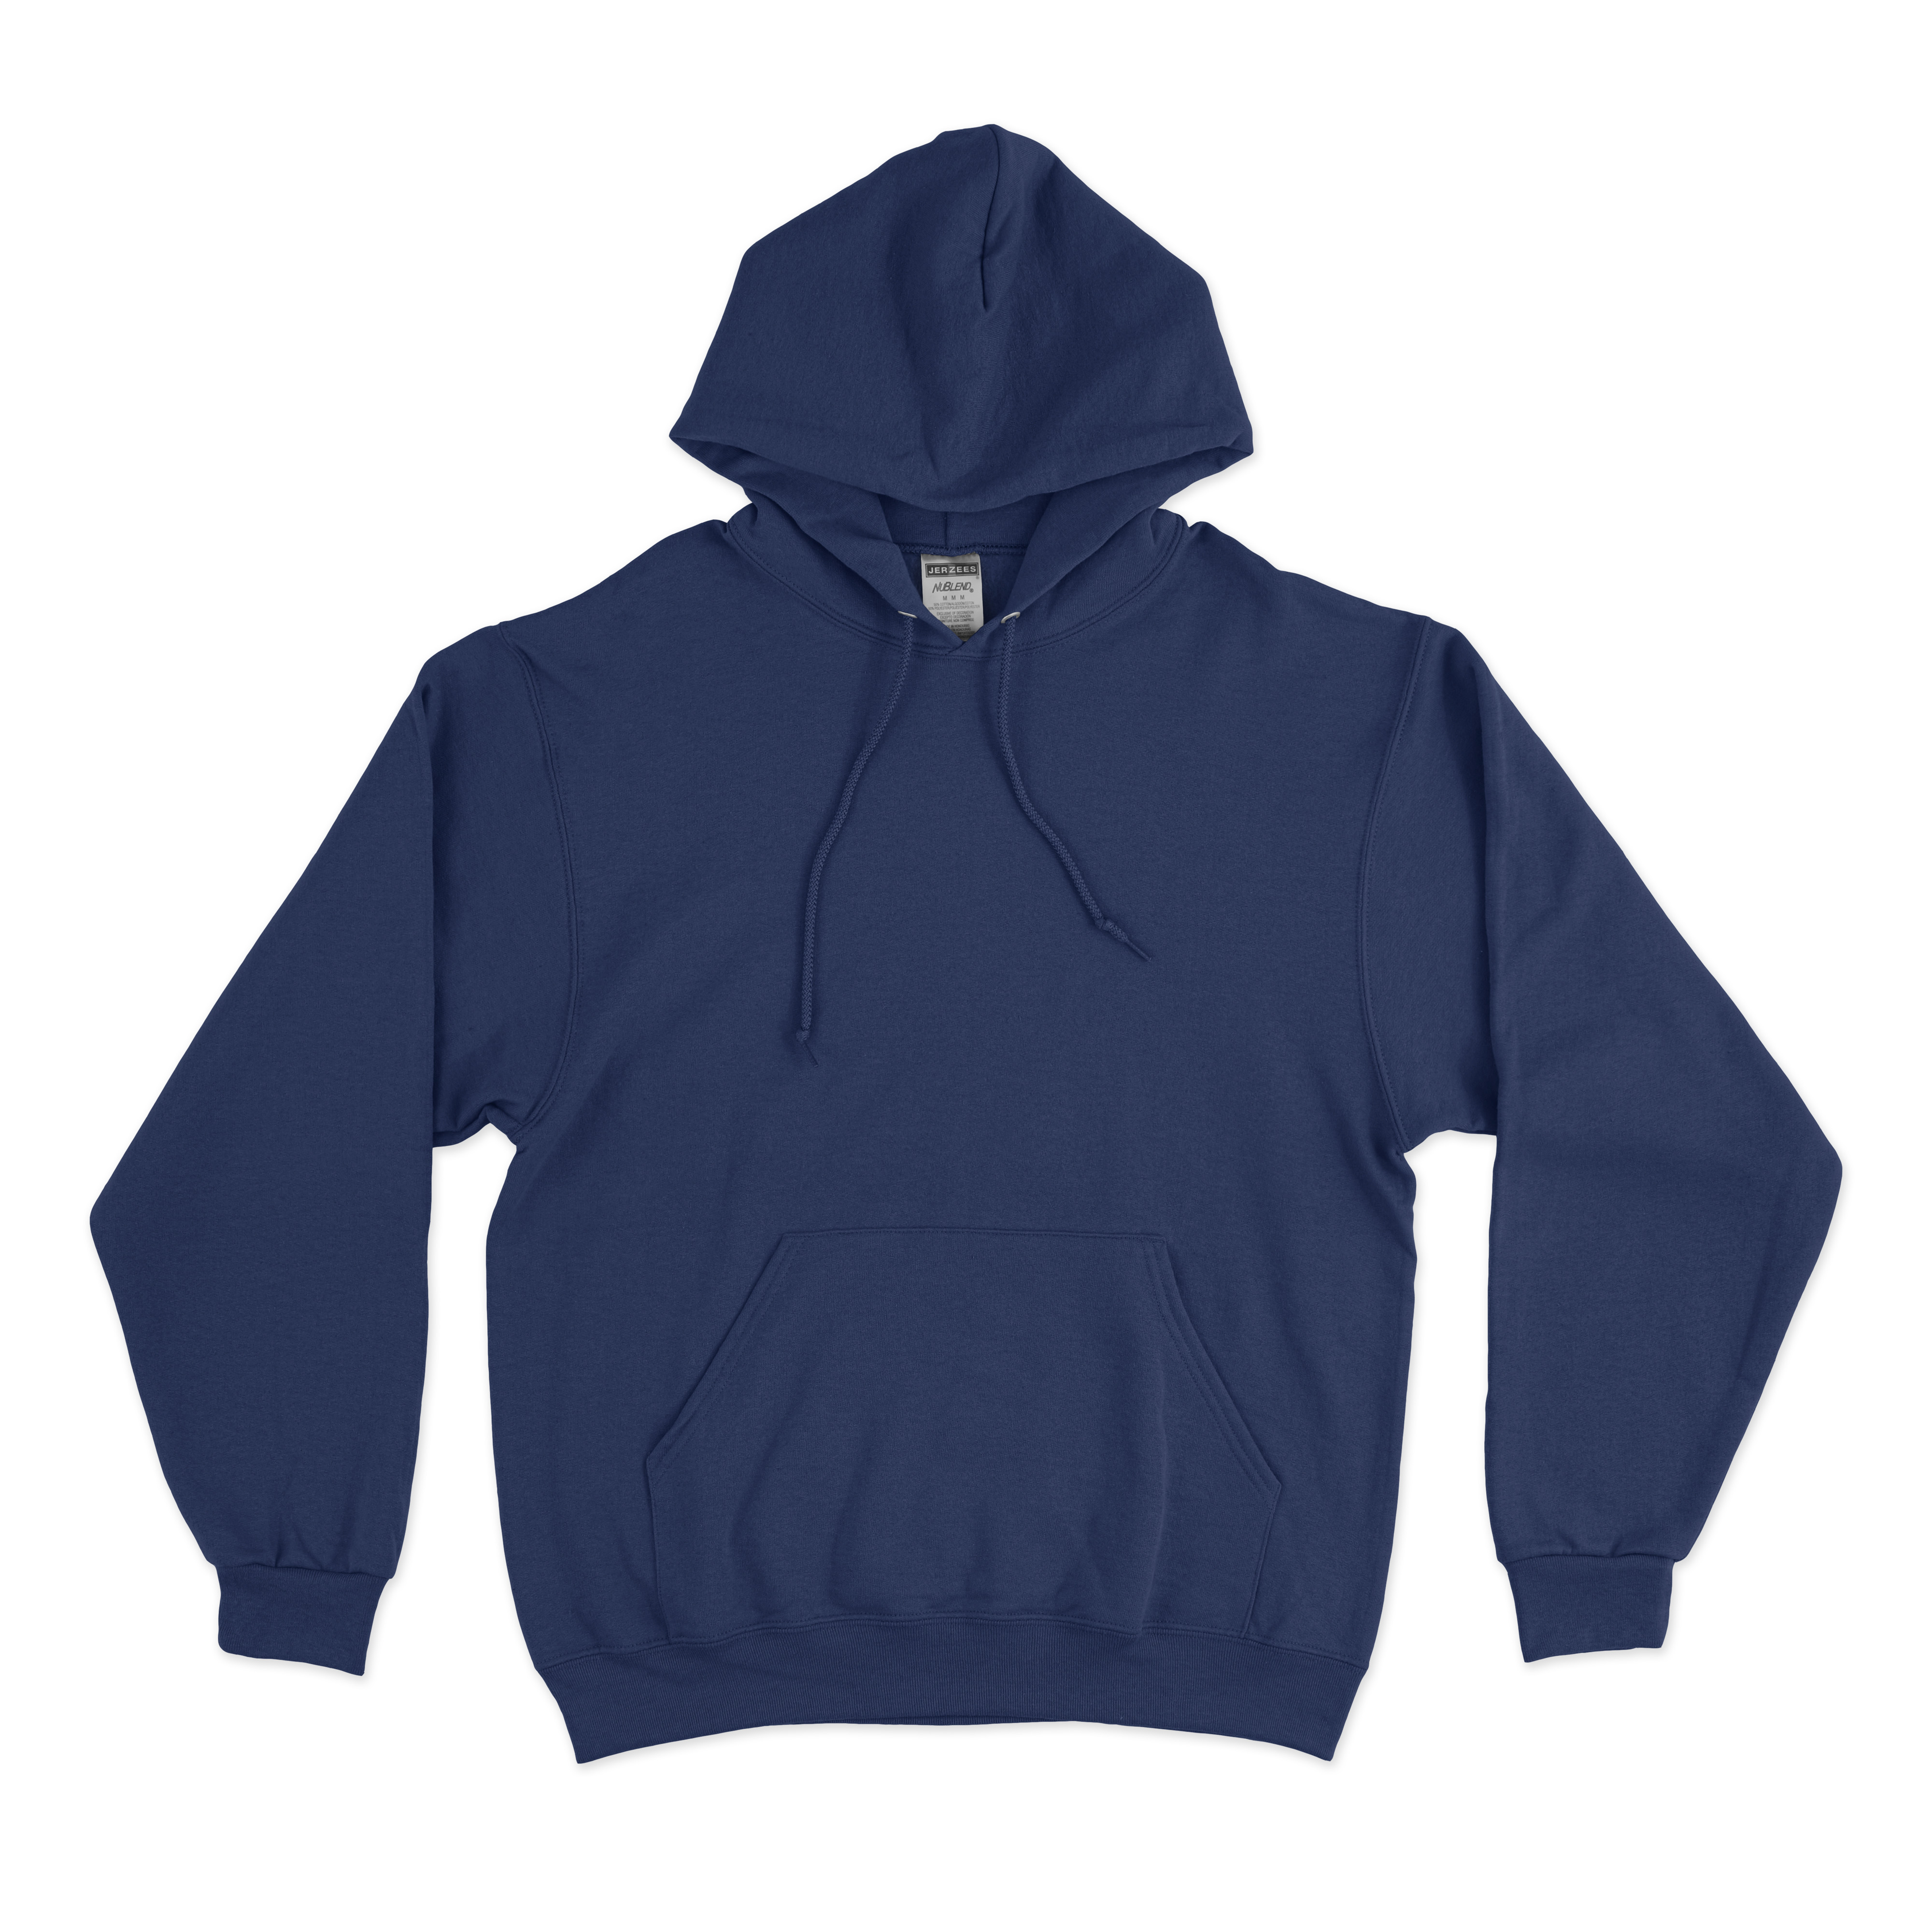 edaf5b07fb3 996MR Jerzees NuBlend® Adult Pull-Over Hoody